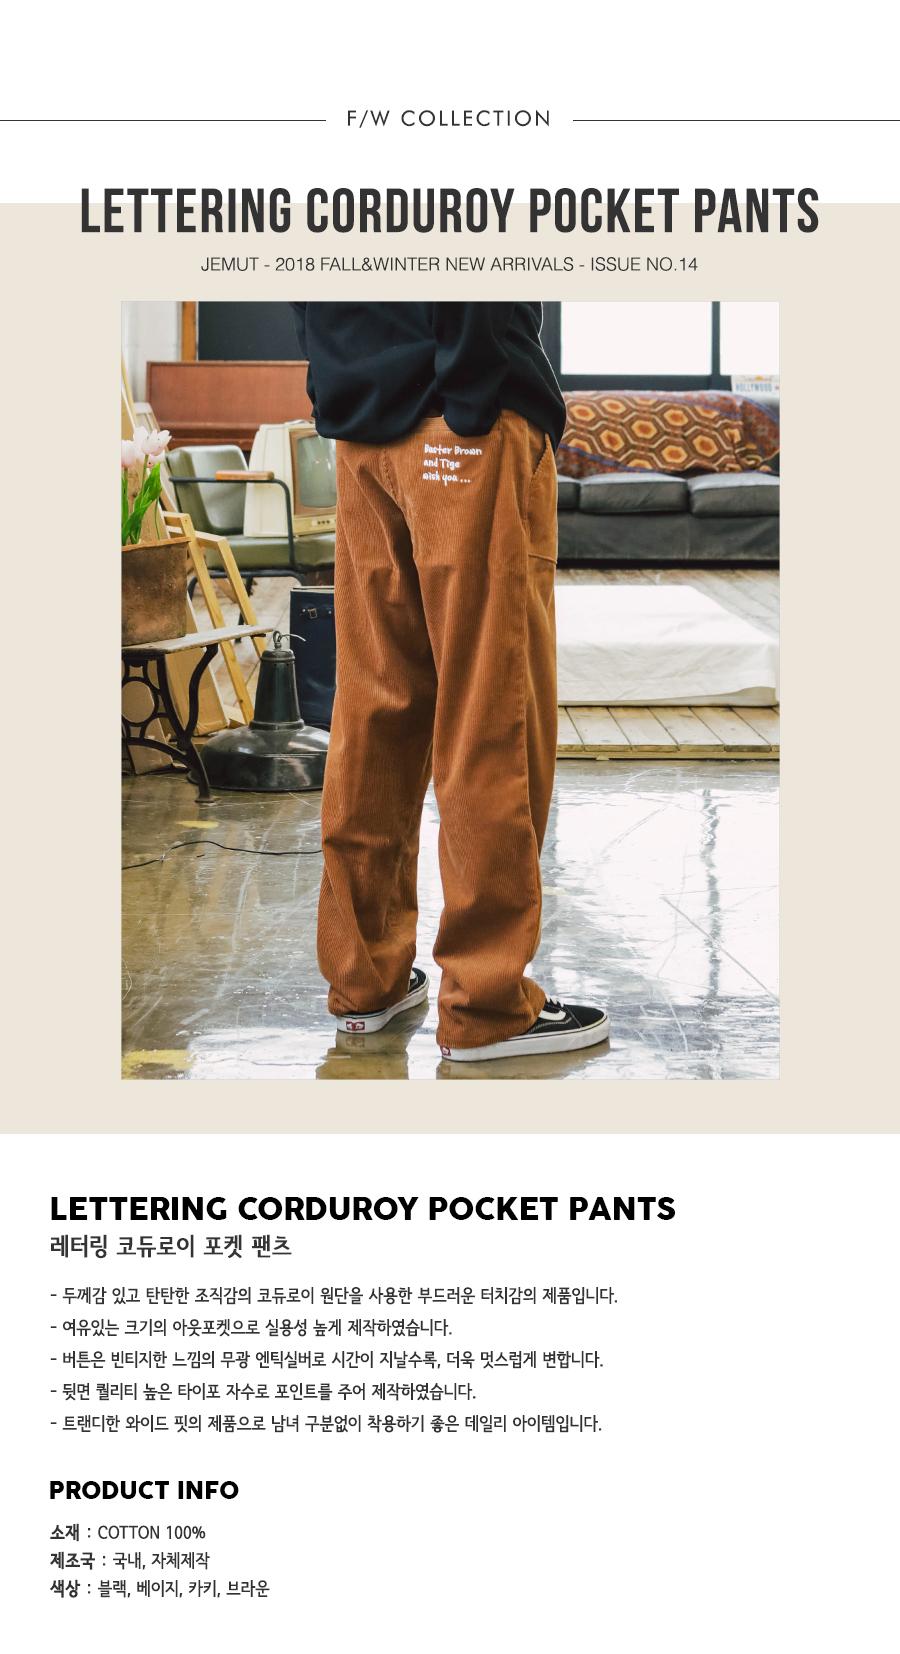 20180910_lettering_corduroy_pants_title_kj.jpg